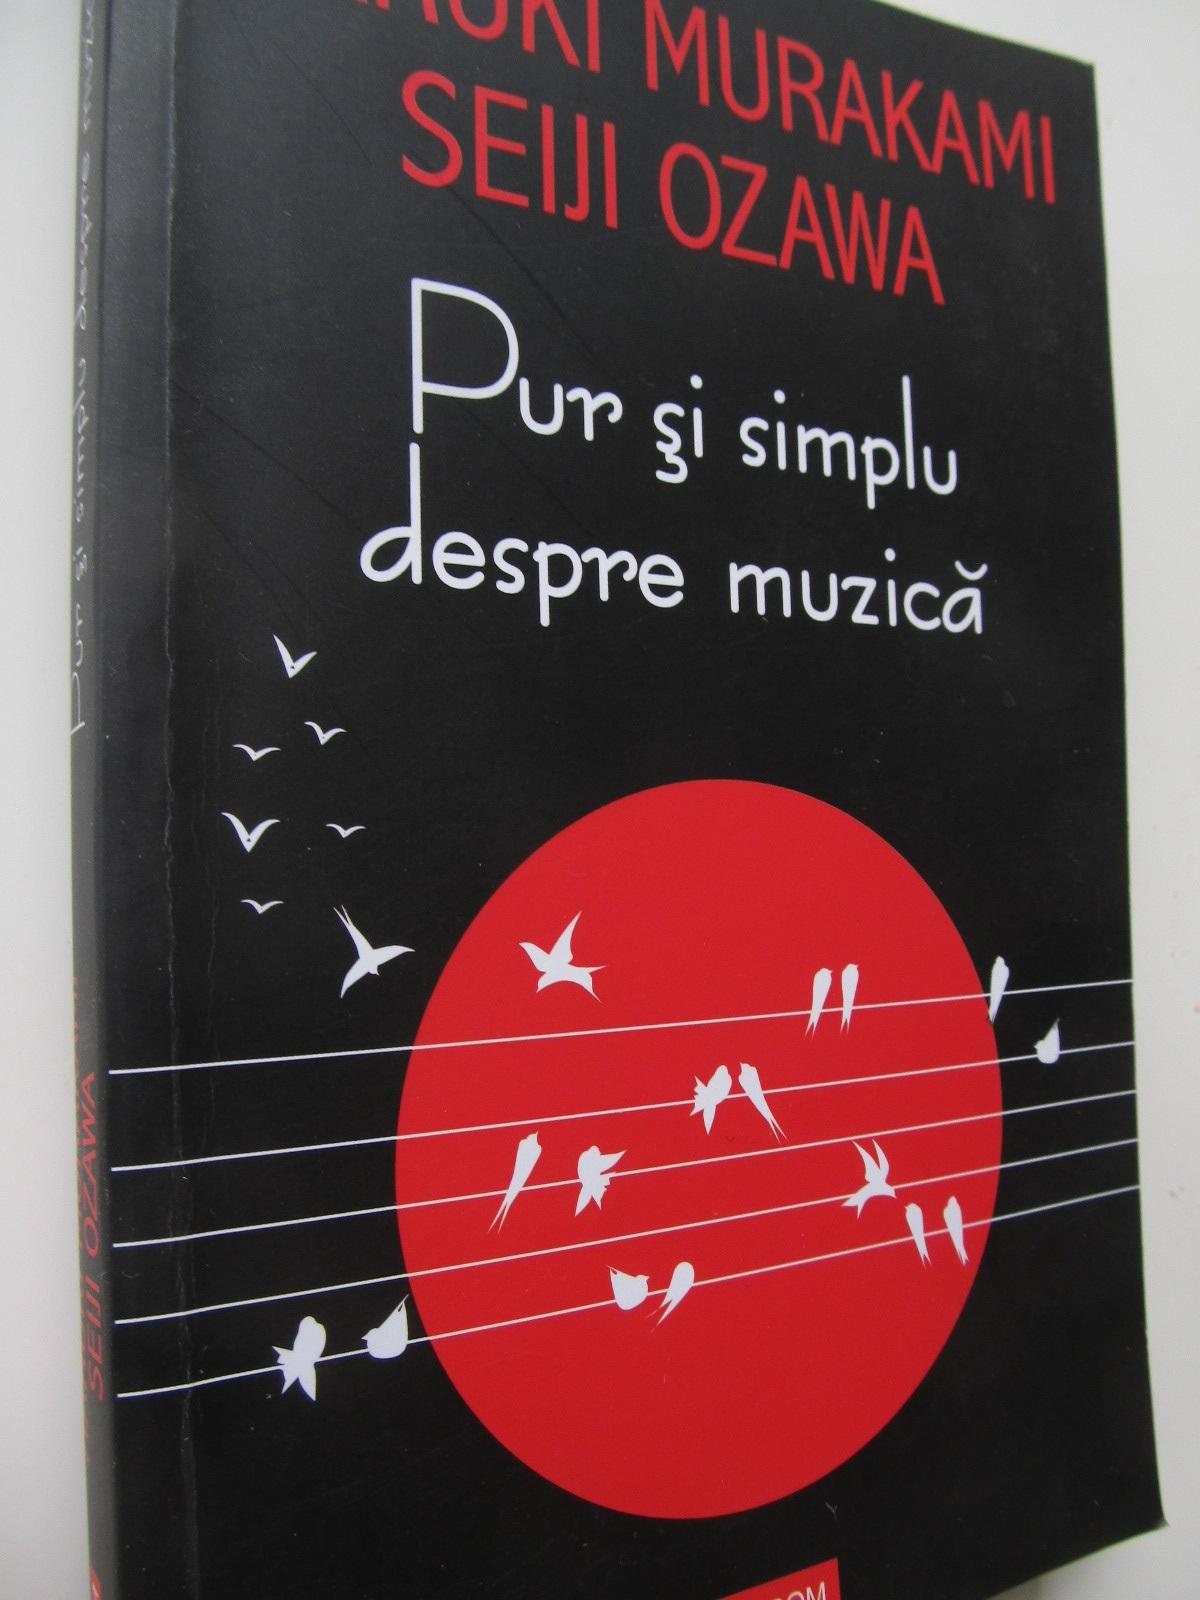 Pur si simplu despre muzica - Haruki Murakami , Seiji Ozawa | Detalii carte